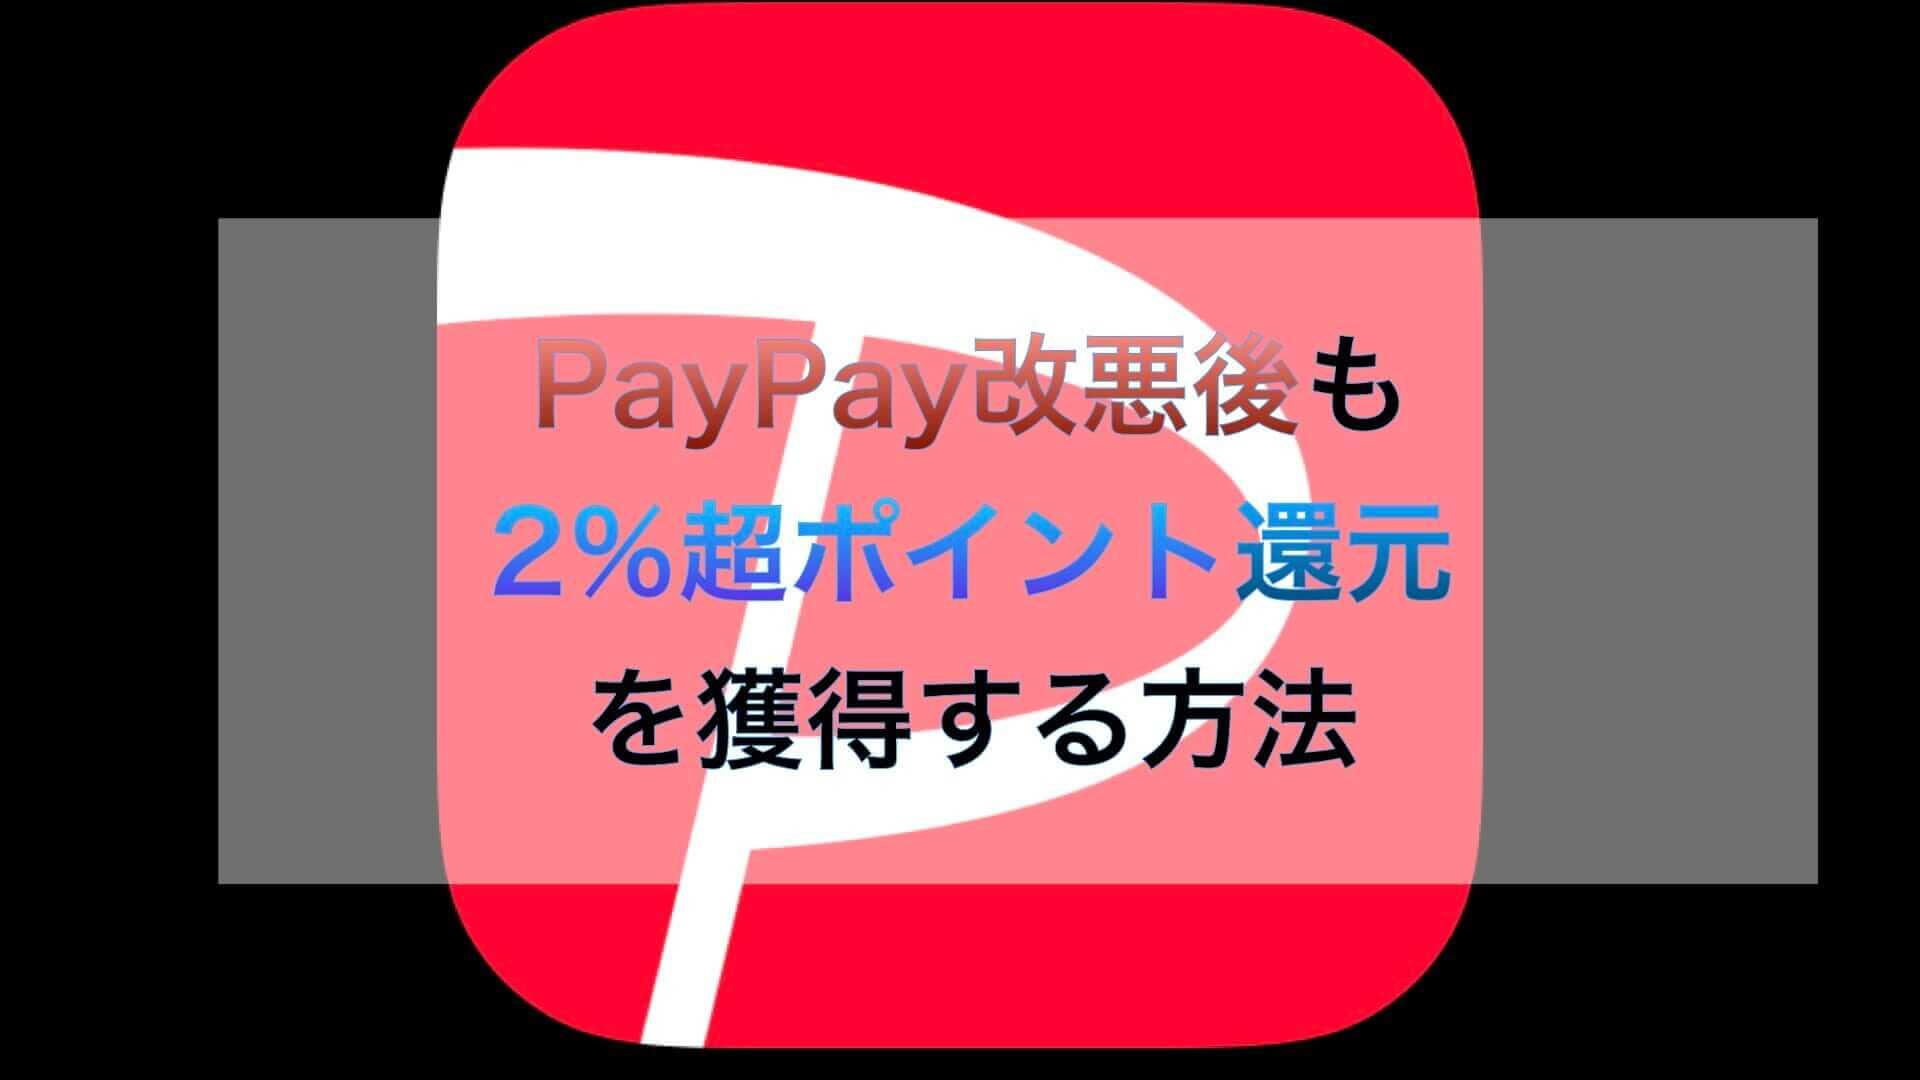 PayPay改悪後も2%超ポイント還元を獲得する方法